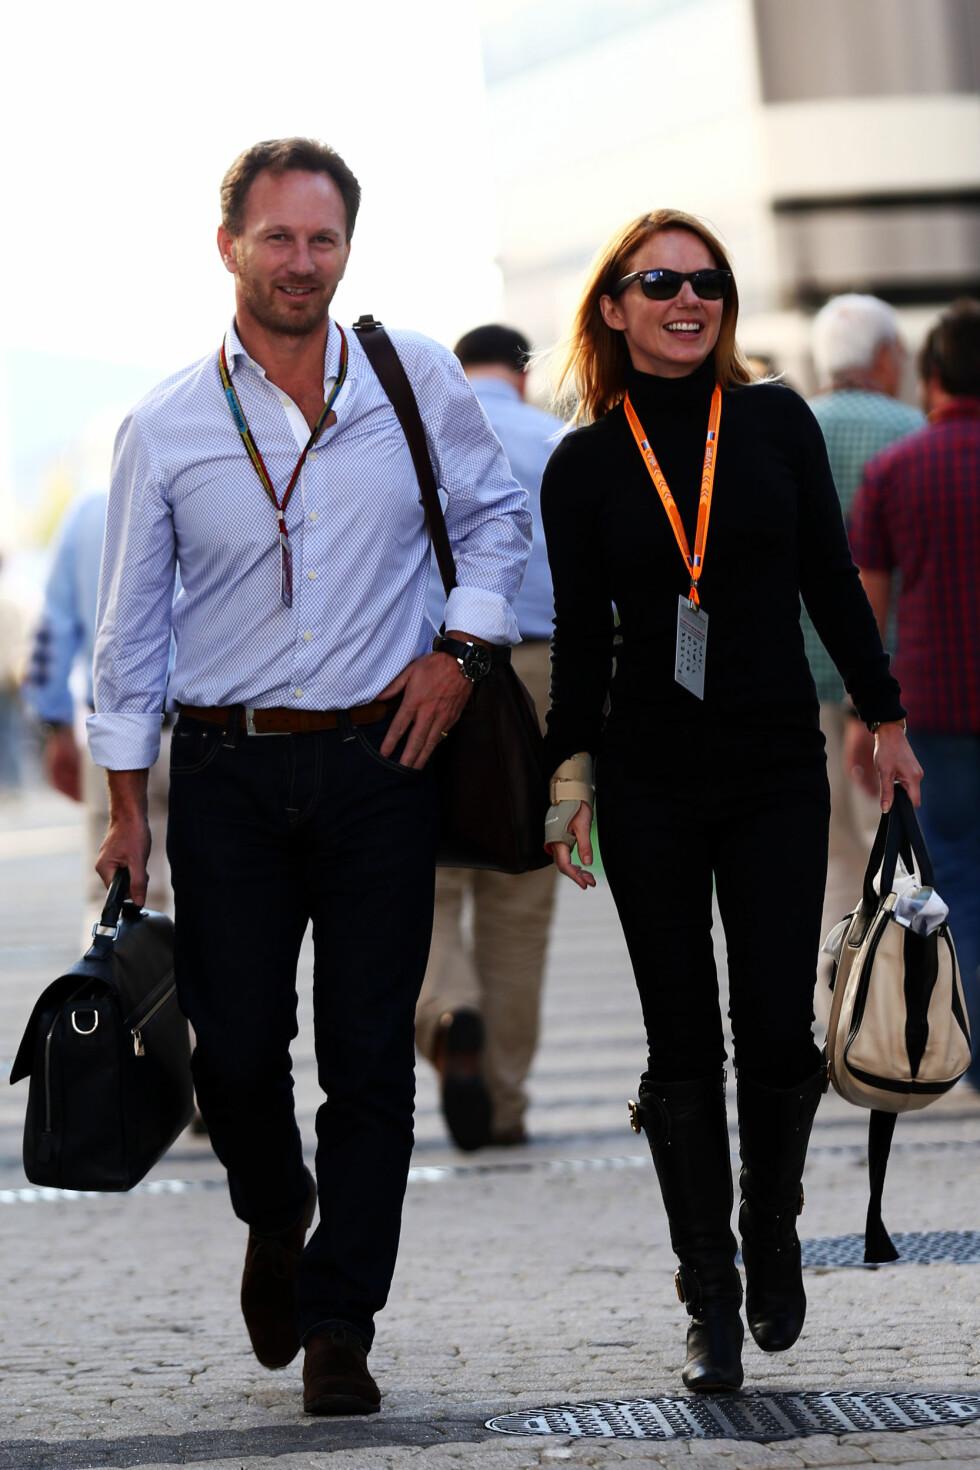 VED MANNENS SIDE: Geri Halliwell og Christian Horner er som erteris. For en måned siden var sangstjernen med kjæresten til Sotsji, i anledning russiske Formel 1 Grand Prix. Foto: Action Press/All Over Press